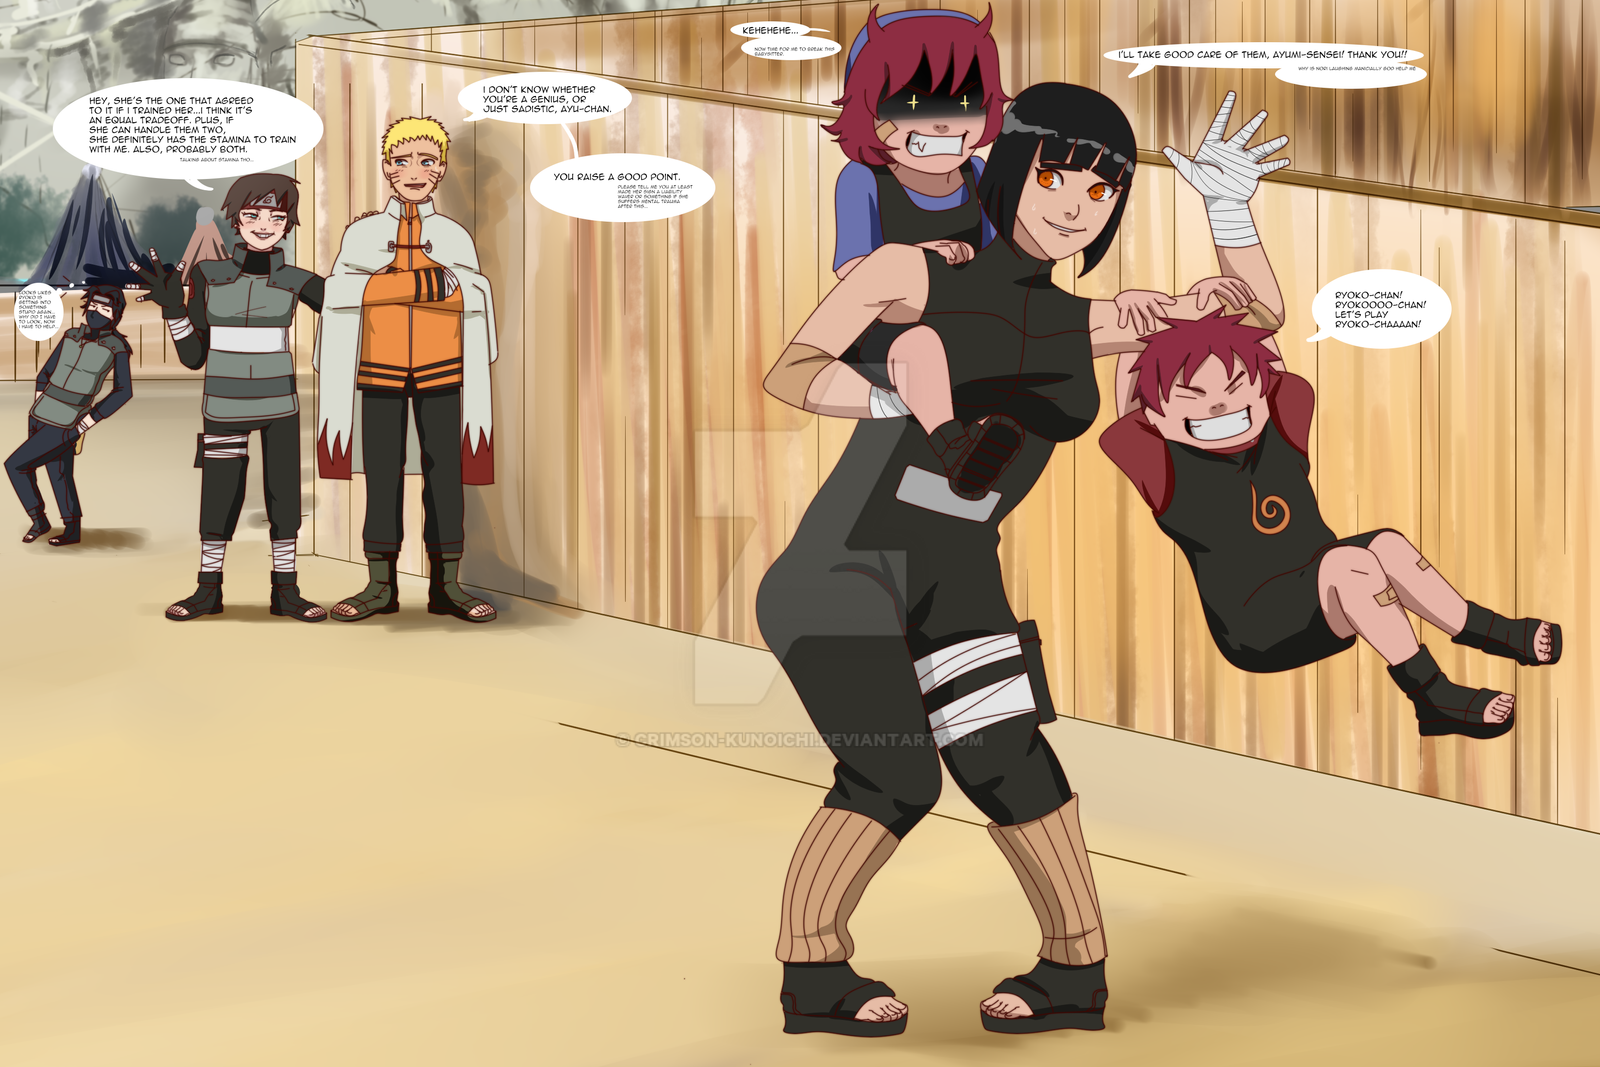 TUK Naruto - Taming the Demon...s by Crimson-Kunoichi